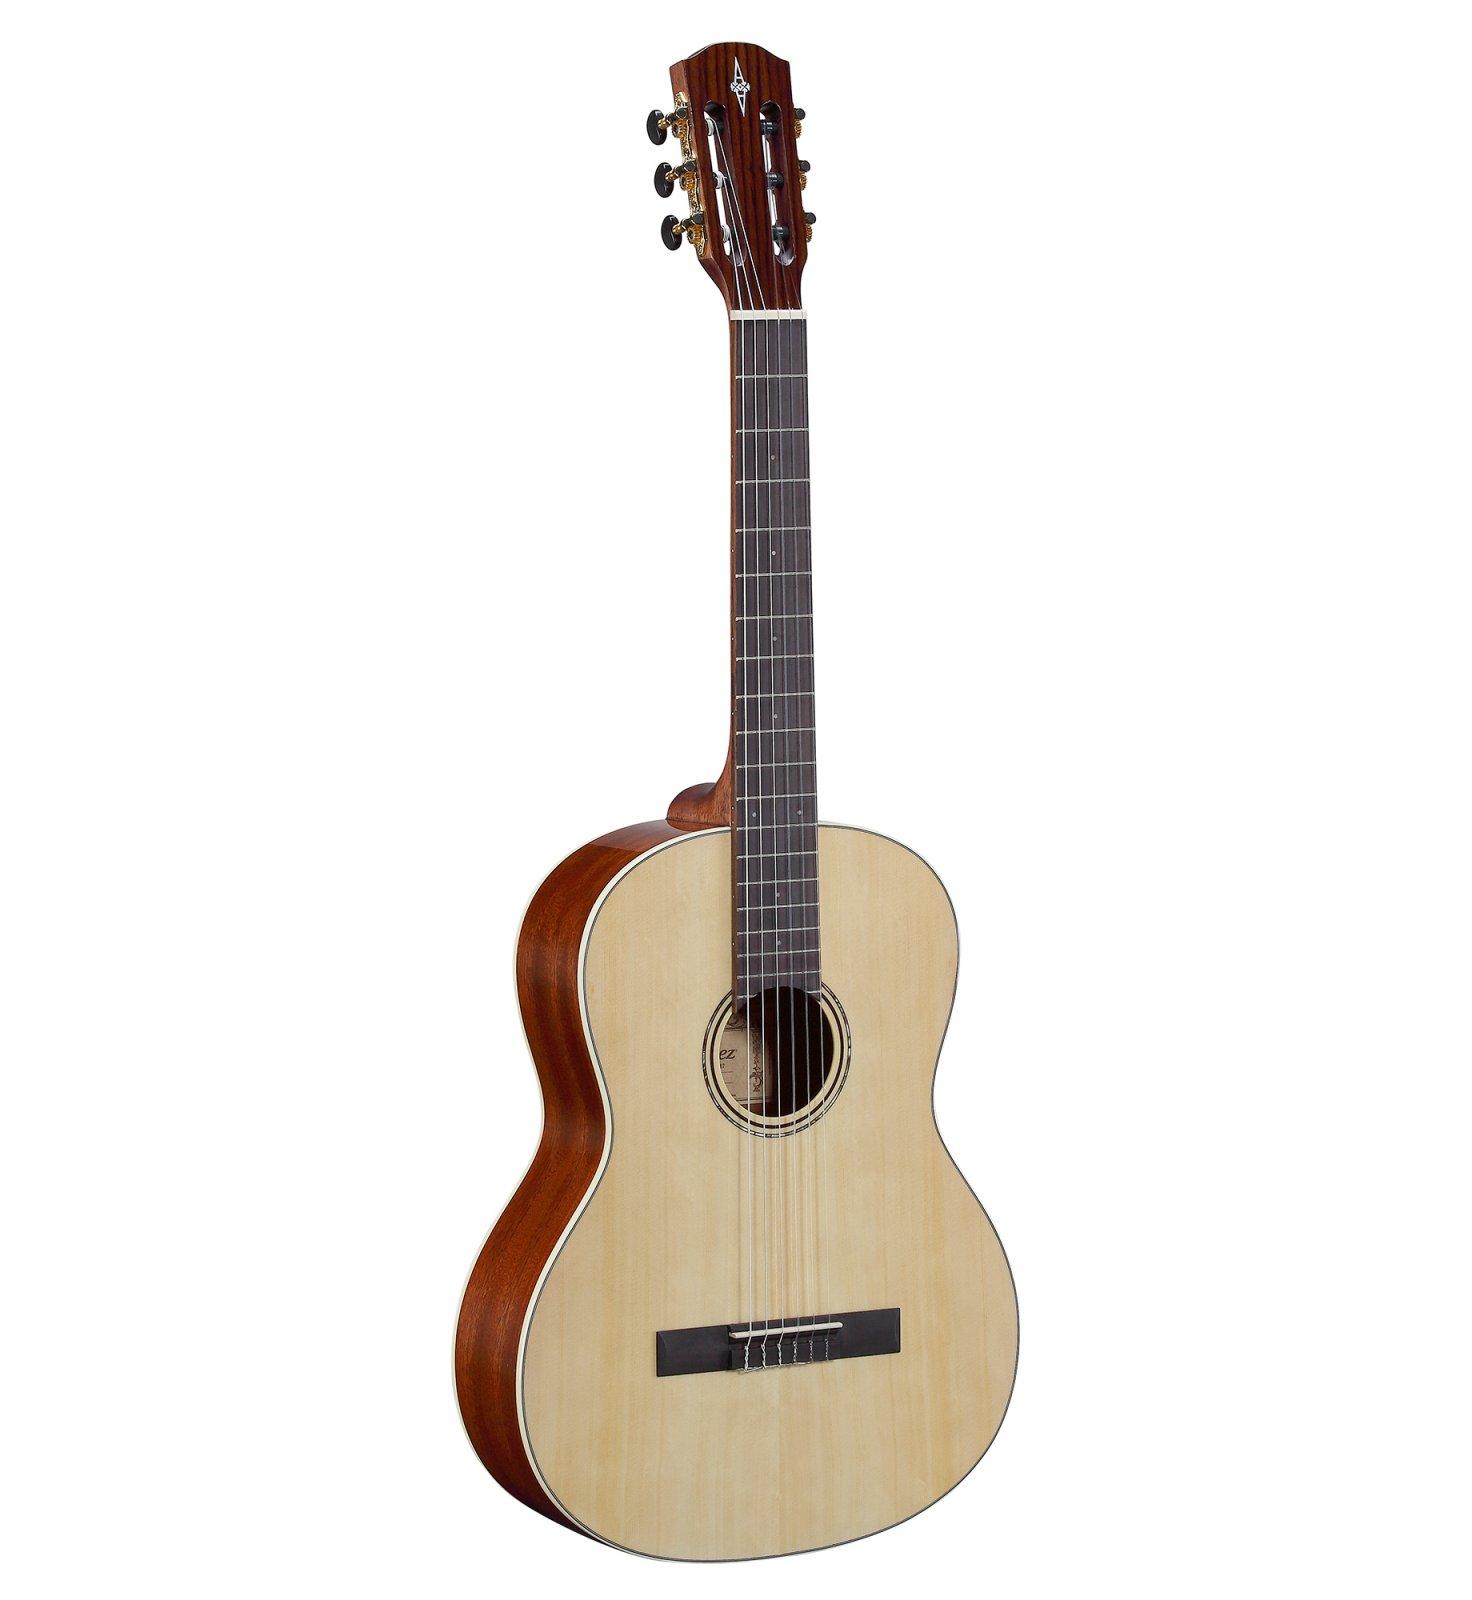 Alvarez RC26 Regent Series Classical Guitar w/ Deluxe Gig Bag